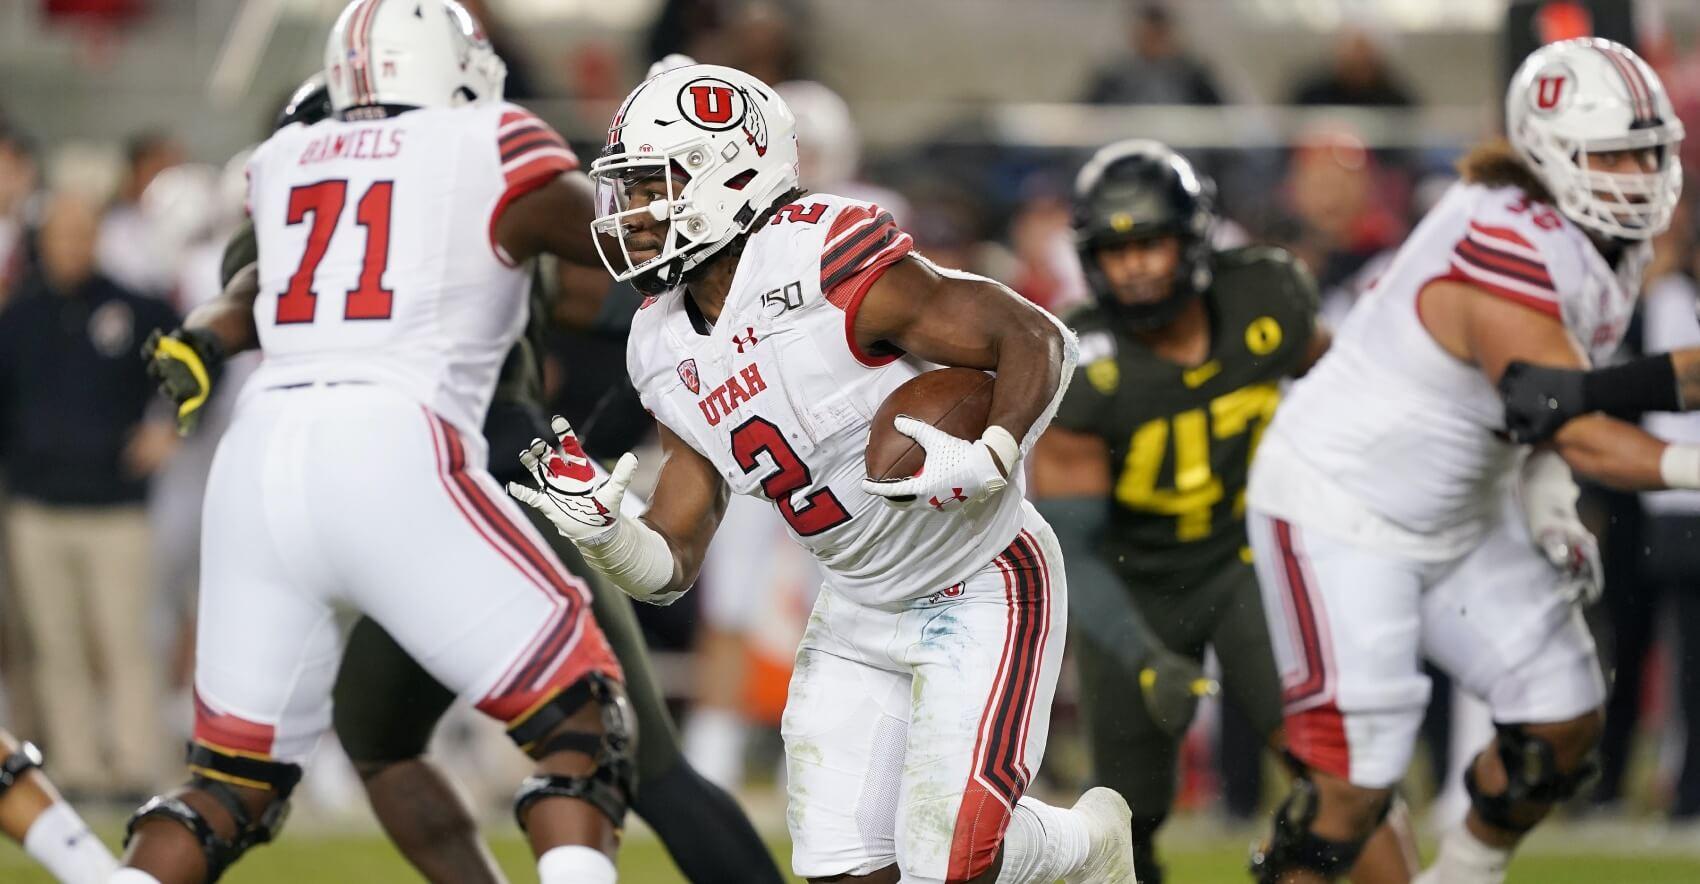 2020 NFL Draft Rookie Profile: Zack Moss (Fantasy Football)